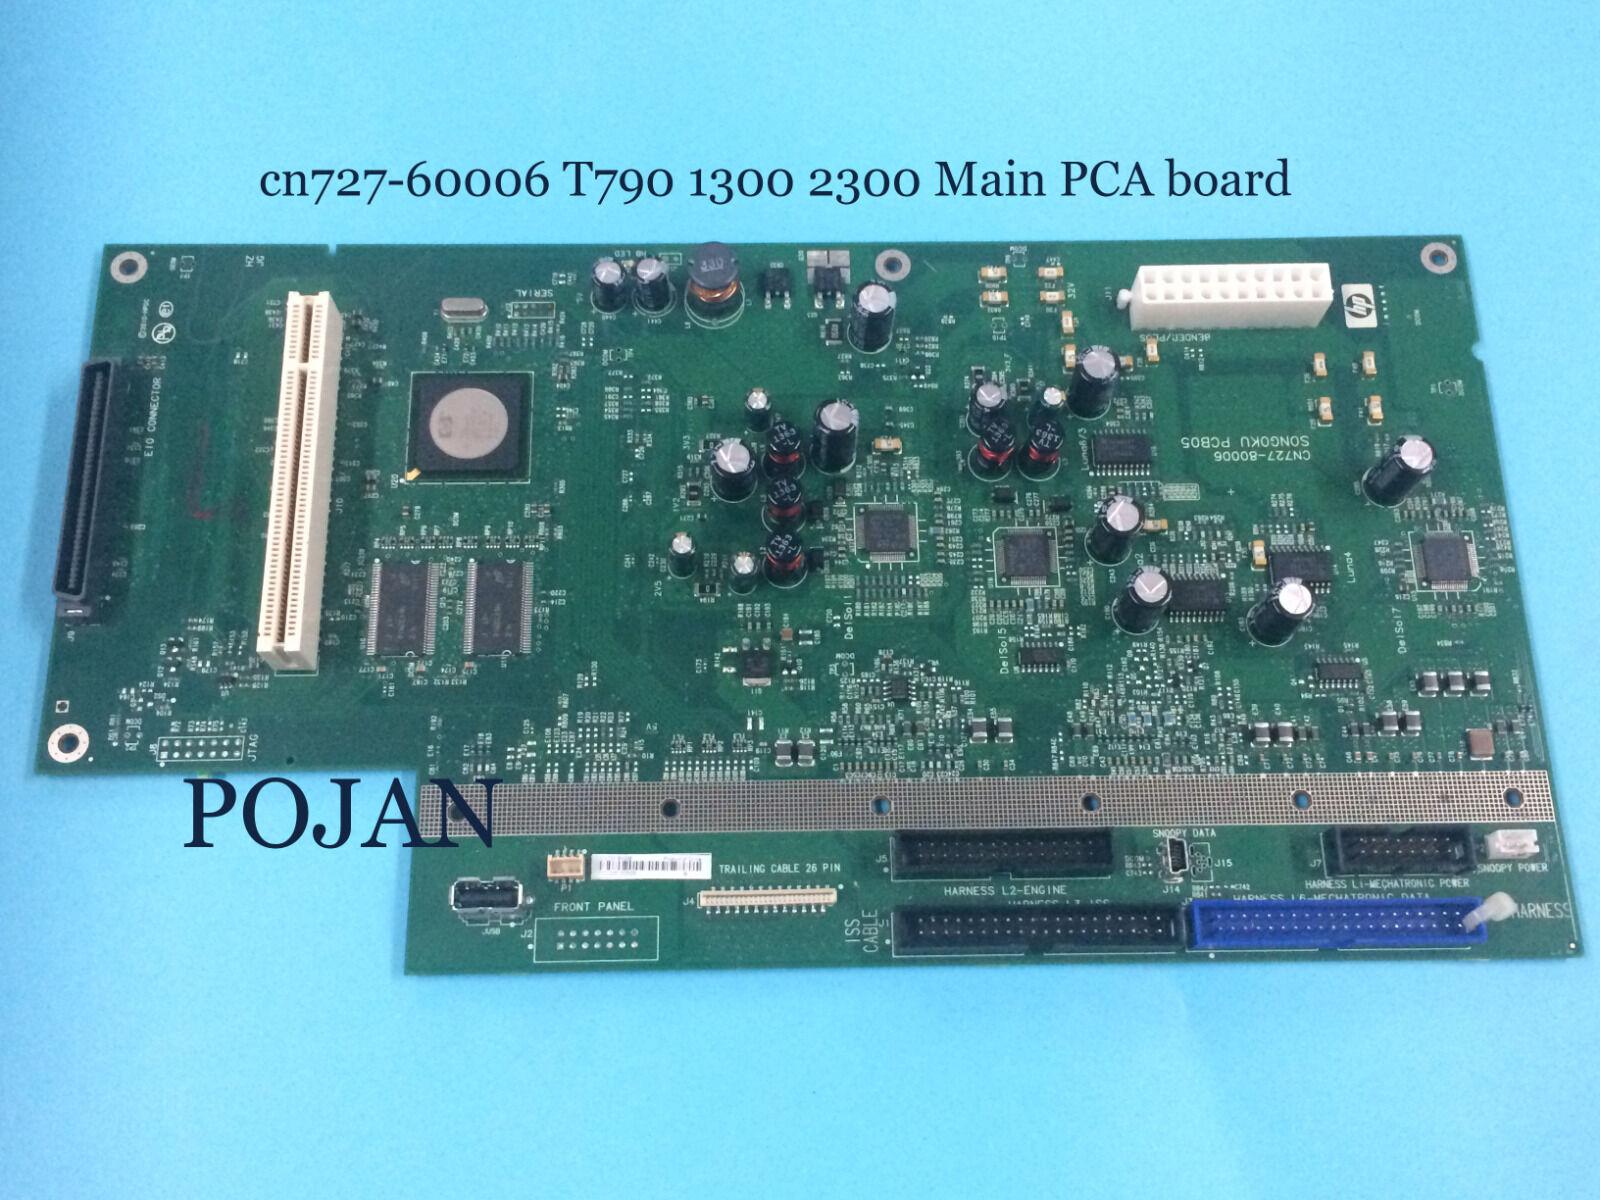 main-pca-board-cho-may-in-hp-designjet-t790-795-1300-2300